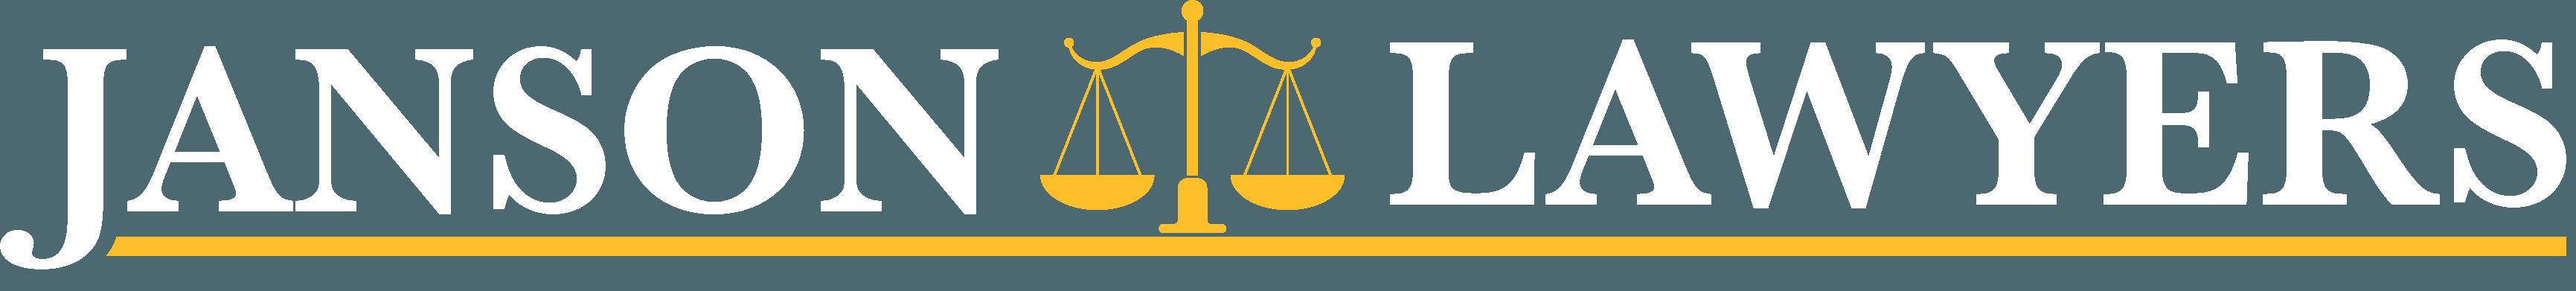 janson lawyers logo